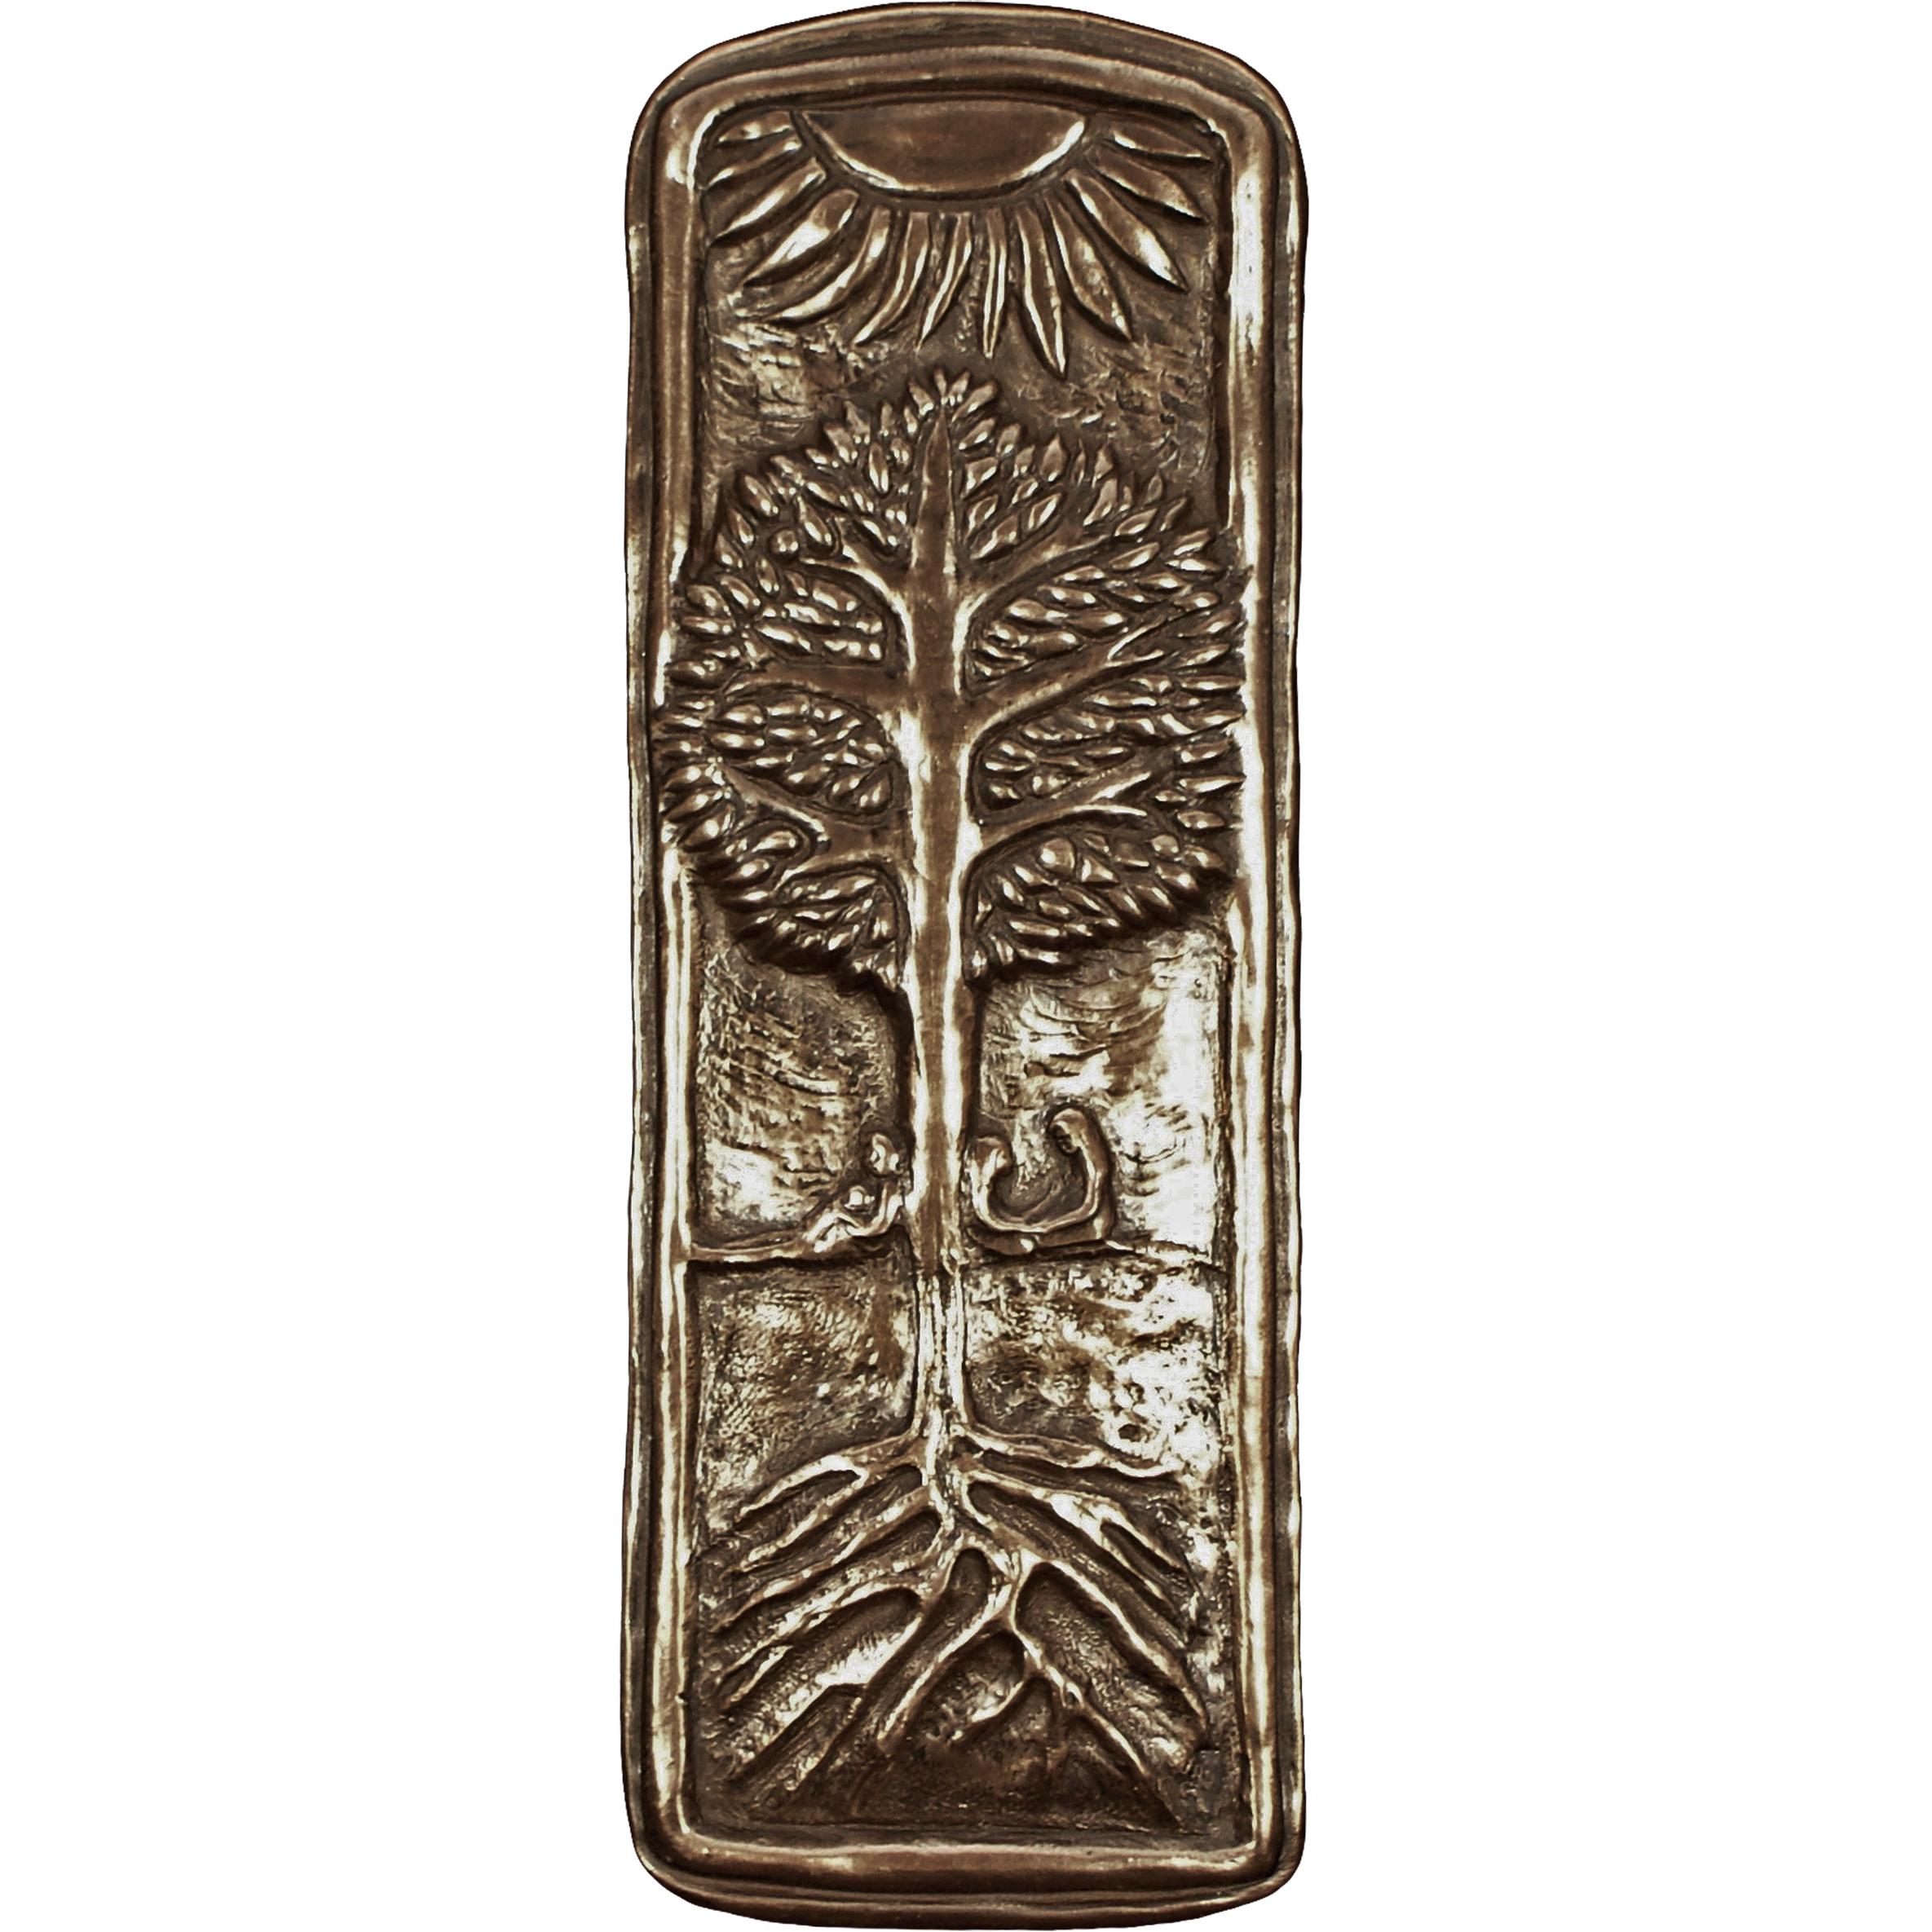 New family tree celtic symbol plaque bronze coated irish made family tree celtic symbol irish plaque wild goose studio sku 349bbz buycottarizona Gallery